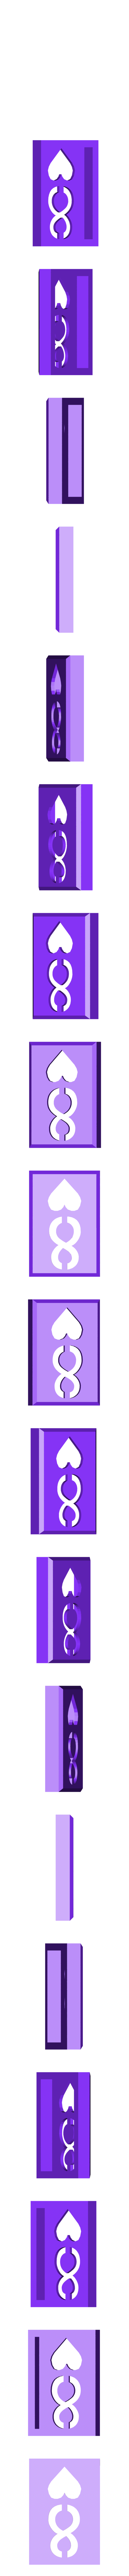 BlockHearts08.stl Download STL file Playing Card Tiles • Object to 3D print, Jinja